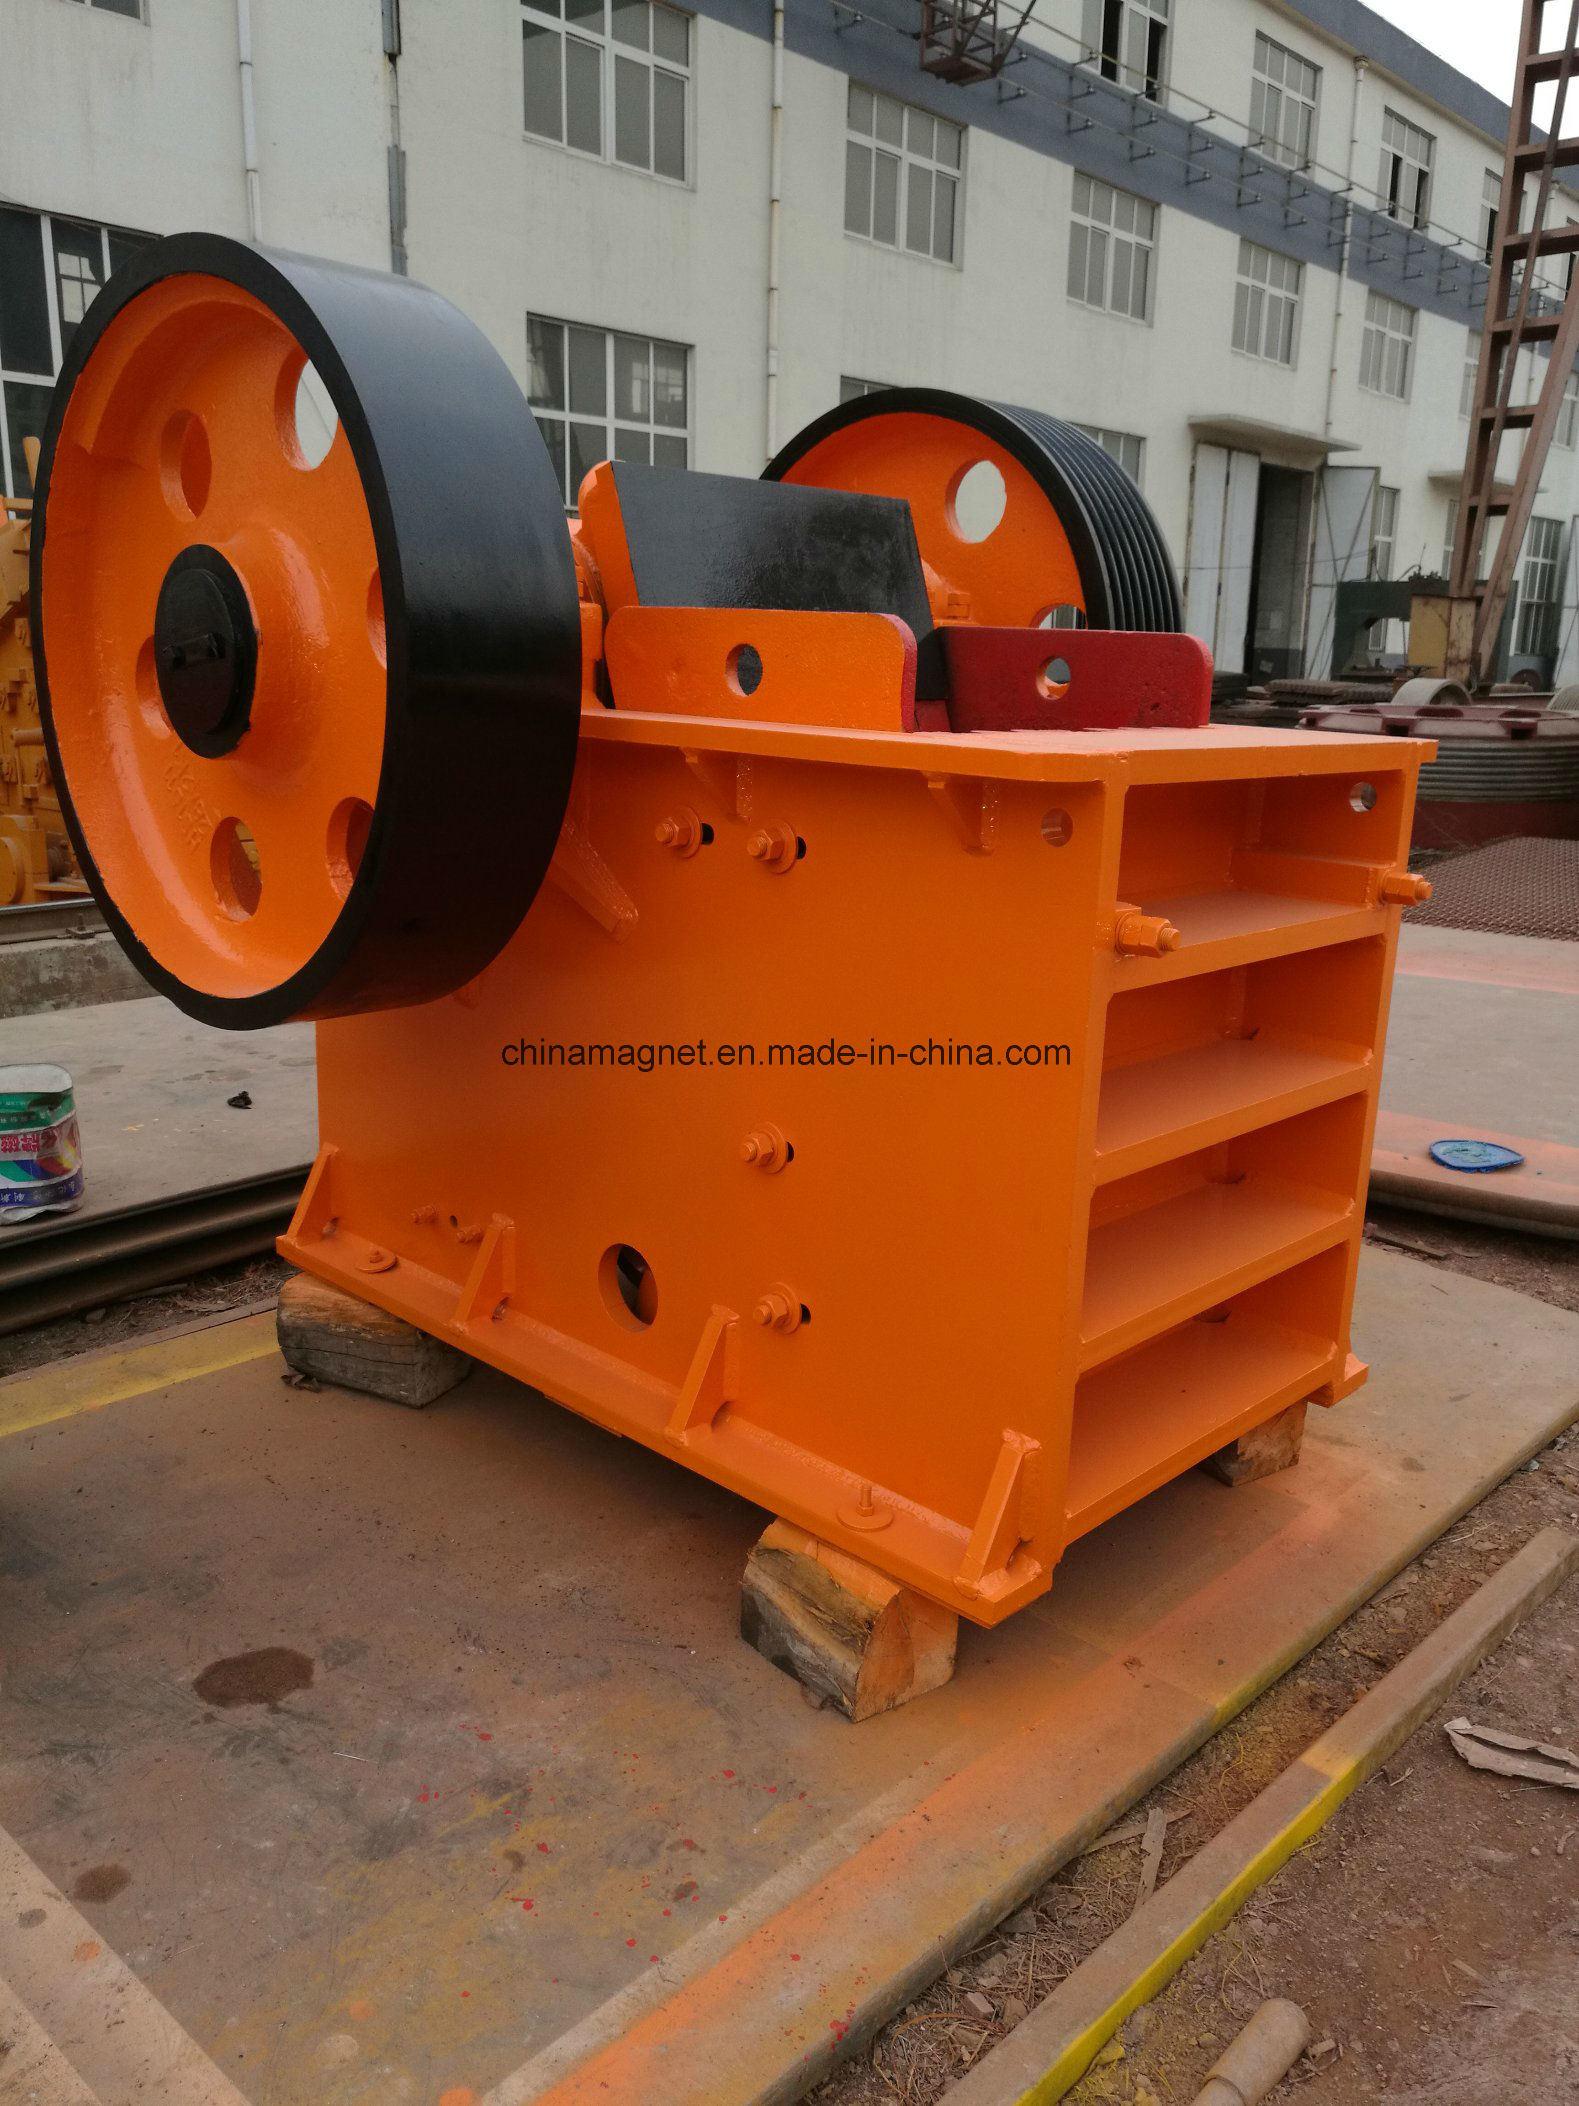 Advanced PE Jaw / Stone Crusher for Quarry/Construction /Limestone/Iron Ore/Mine Ore /Copper Ore/Gravity Primary Crushing